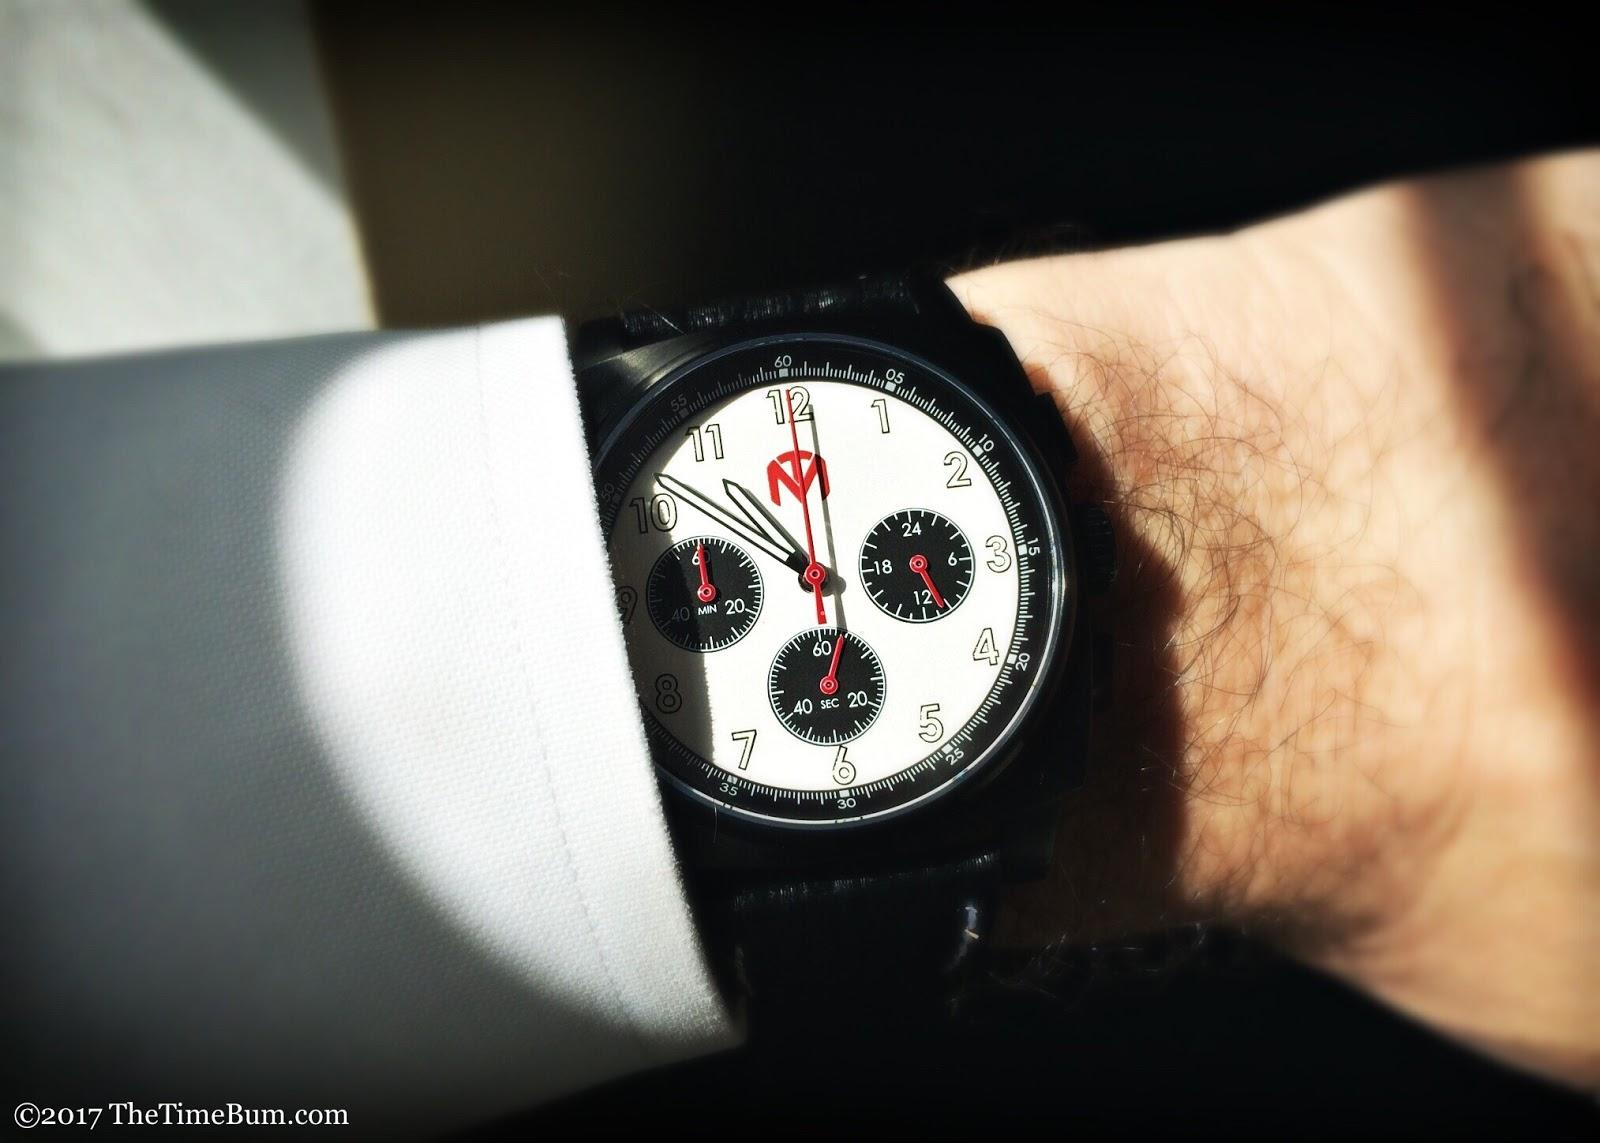 McDowell Time Sonoma prototype wrist